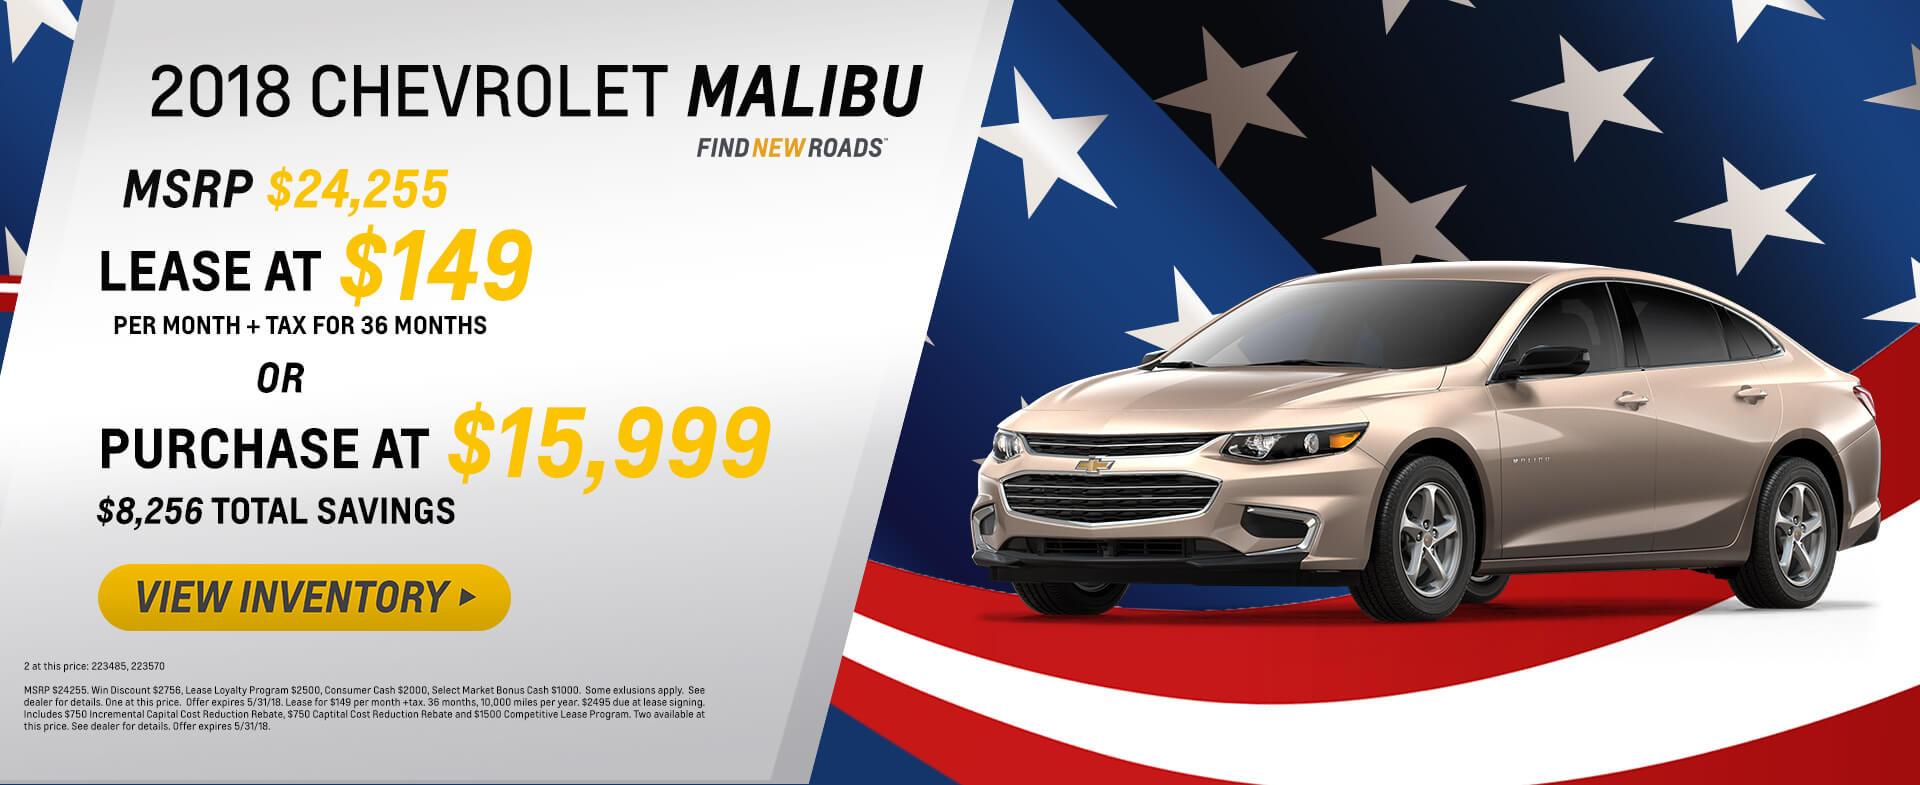 2018 Chevy Malibu $149